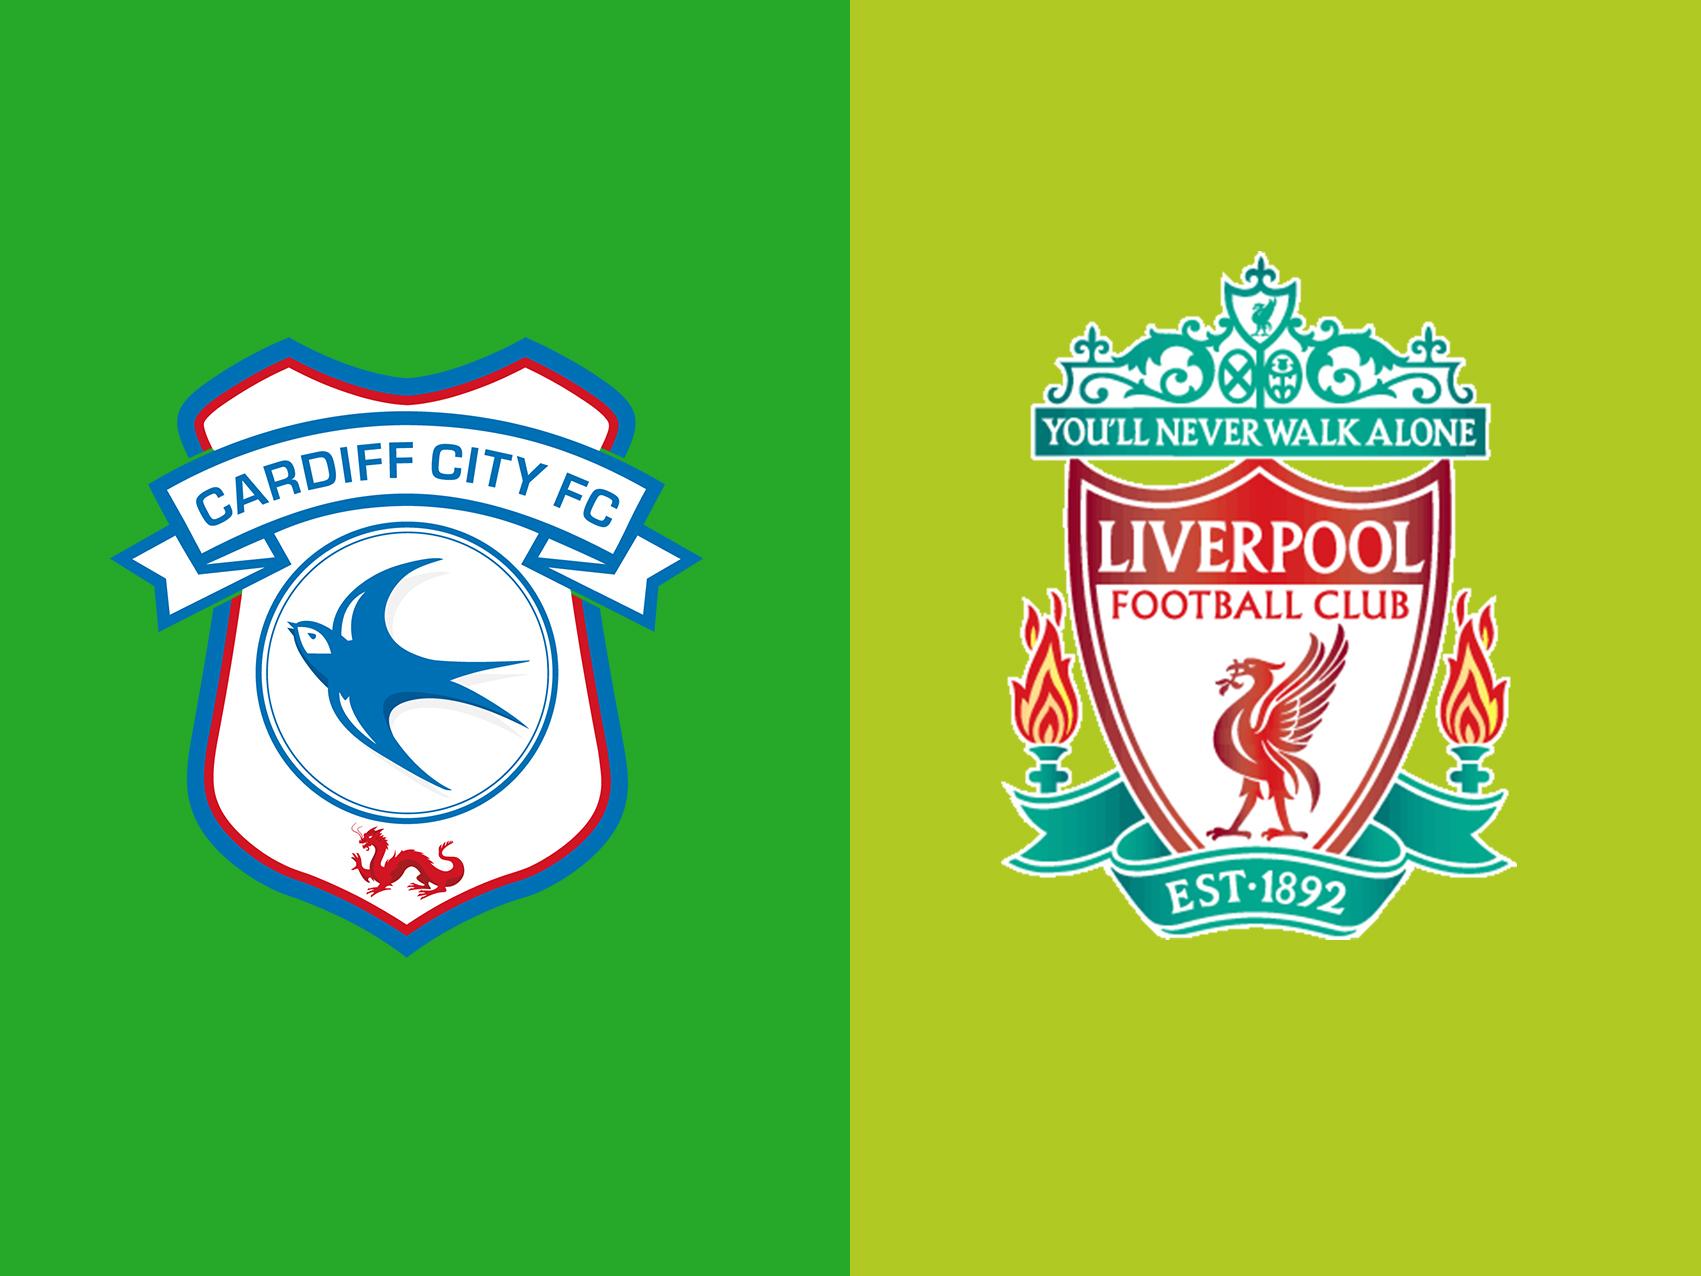 soi-keo-ca-cuoc-bong-da-ngay-21-4-slavia-praha-vs-Liverpool-cong-pha-phao-dai-b9 1